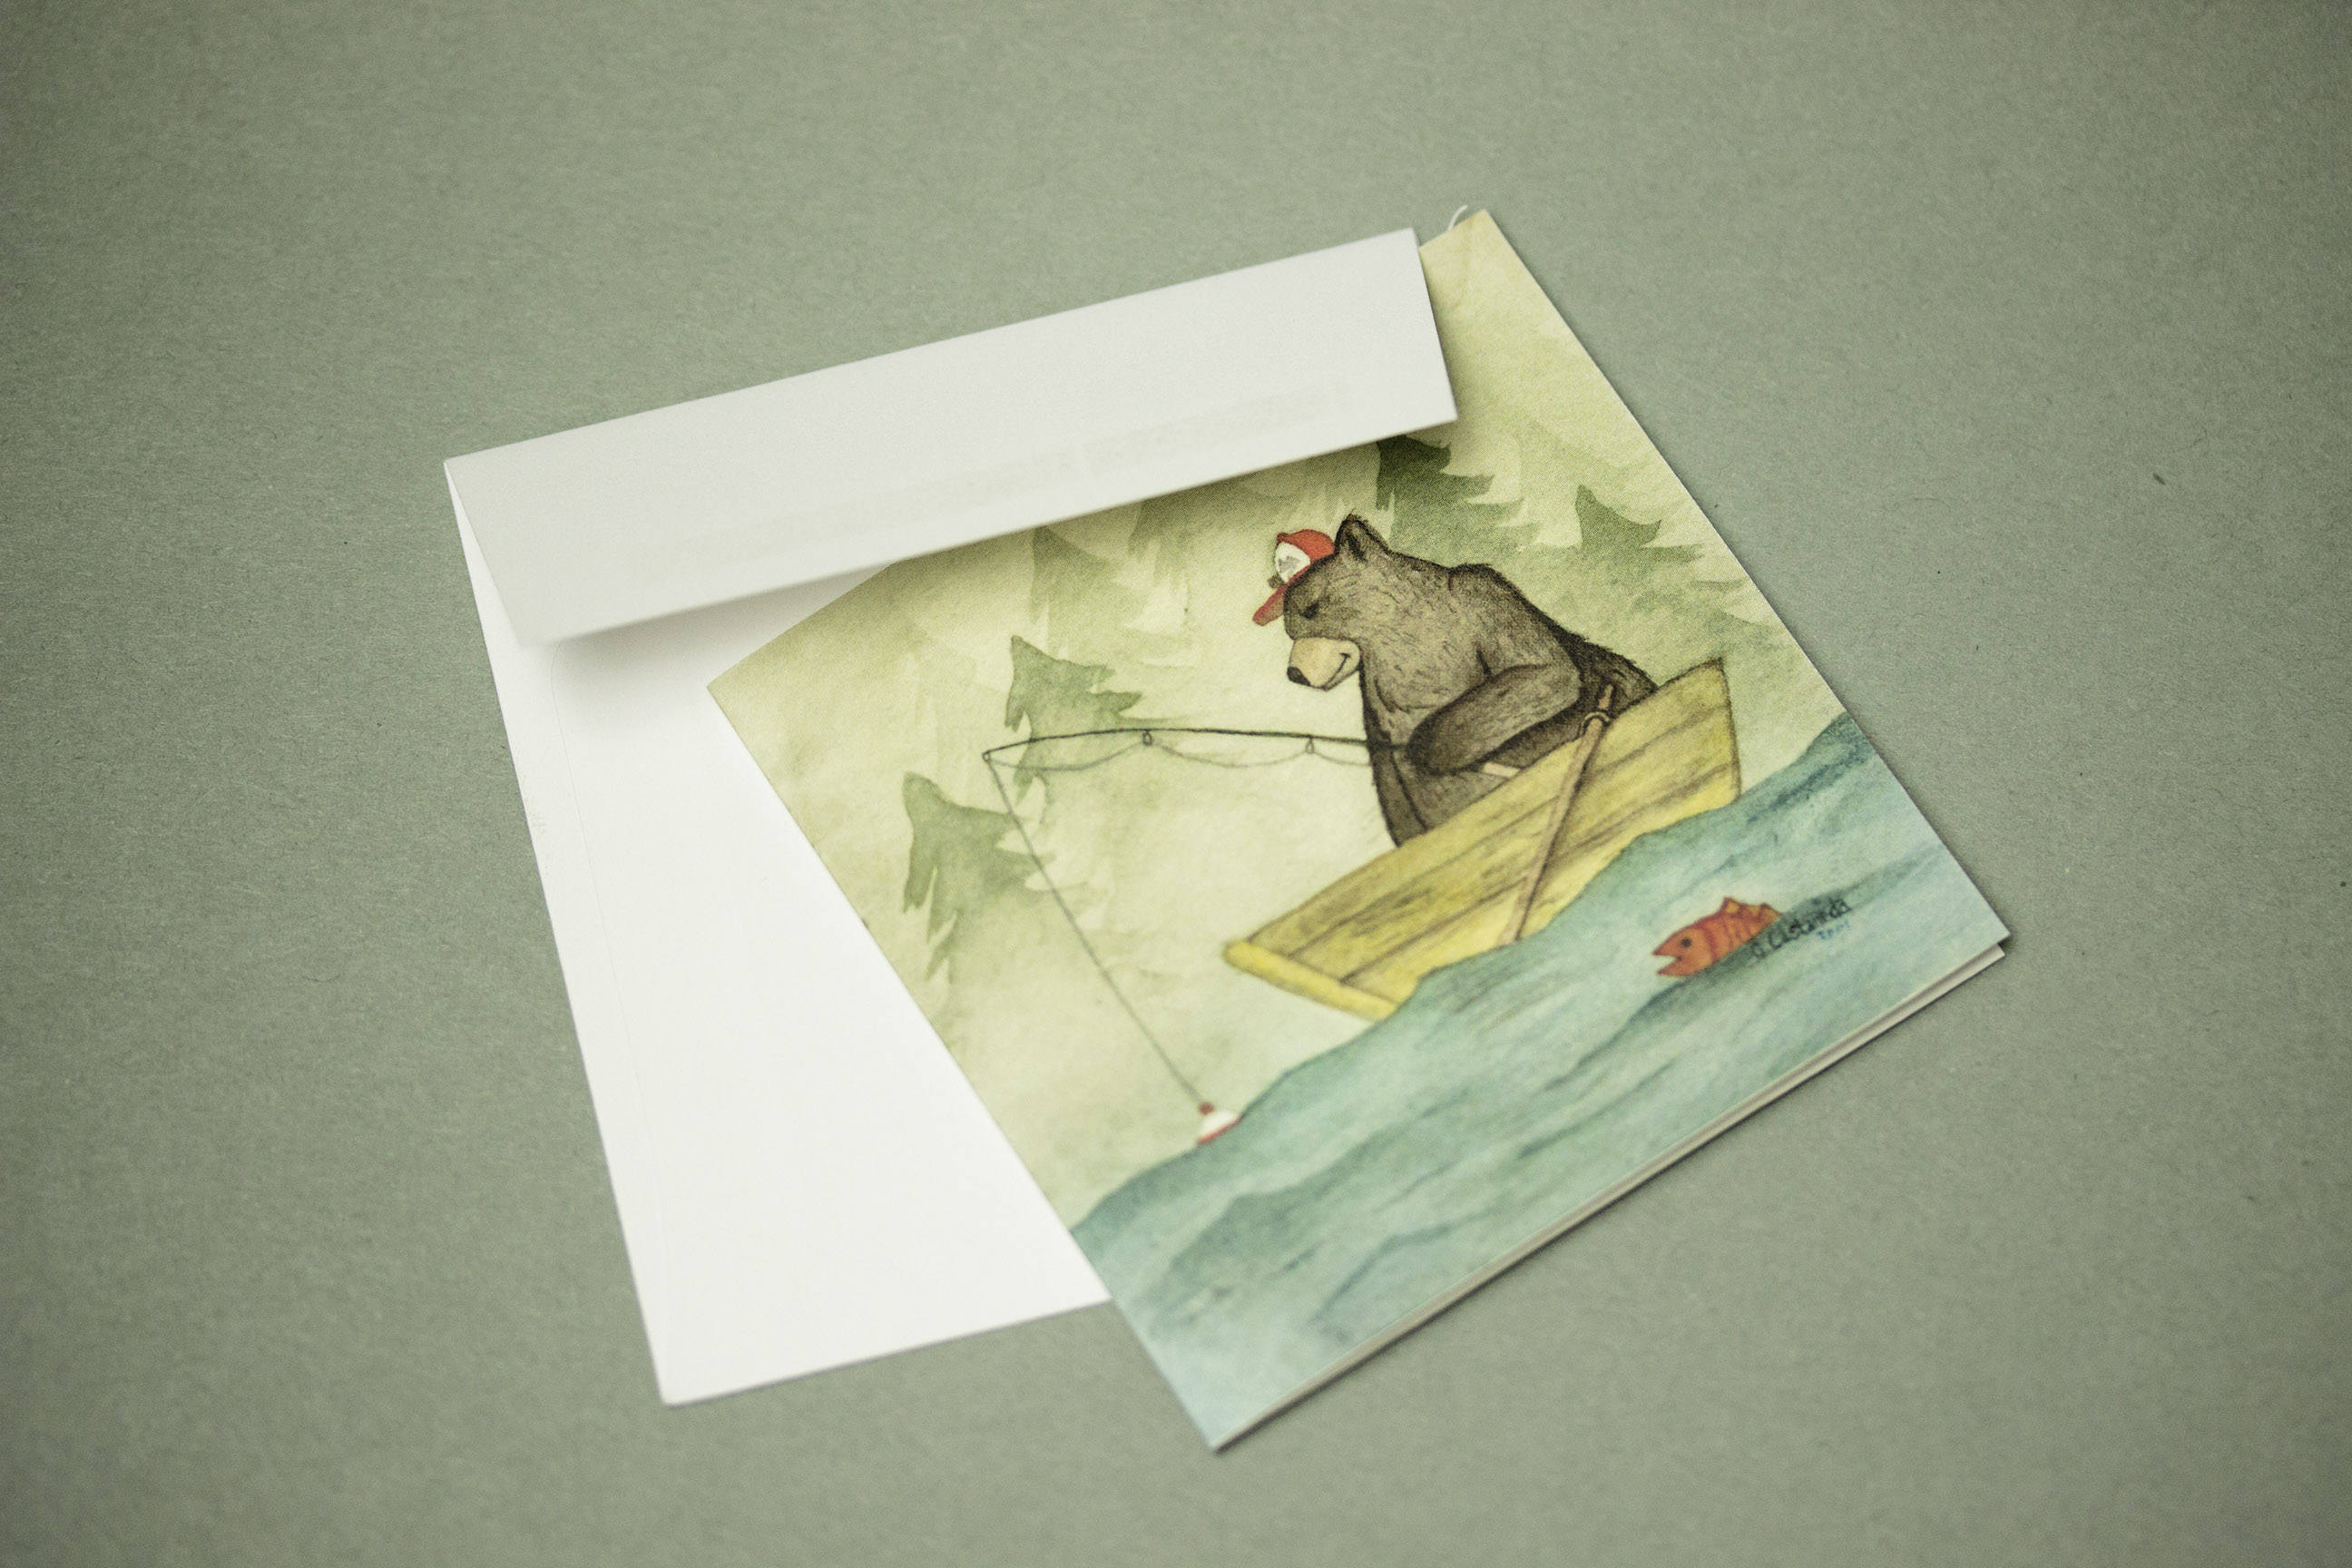 Bear greeting card mini greeting card thank you cards lou moss bear greeting card mini greeting card thank you cards kristyandbryce Gallery